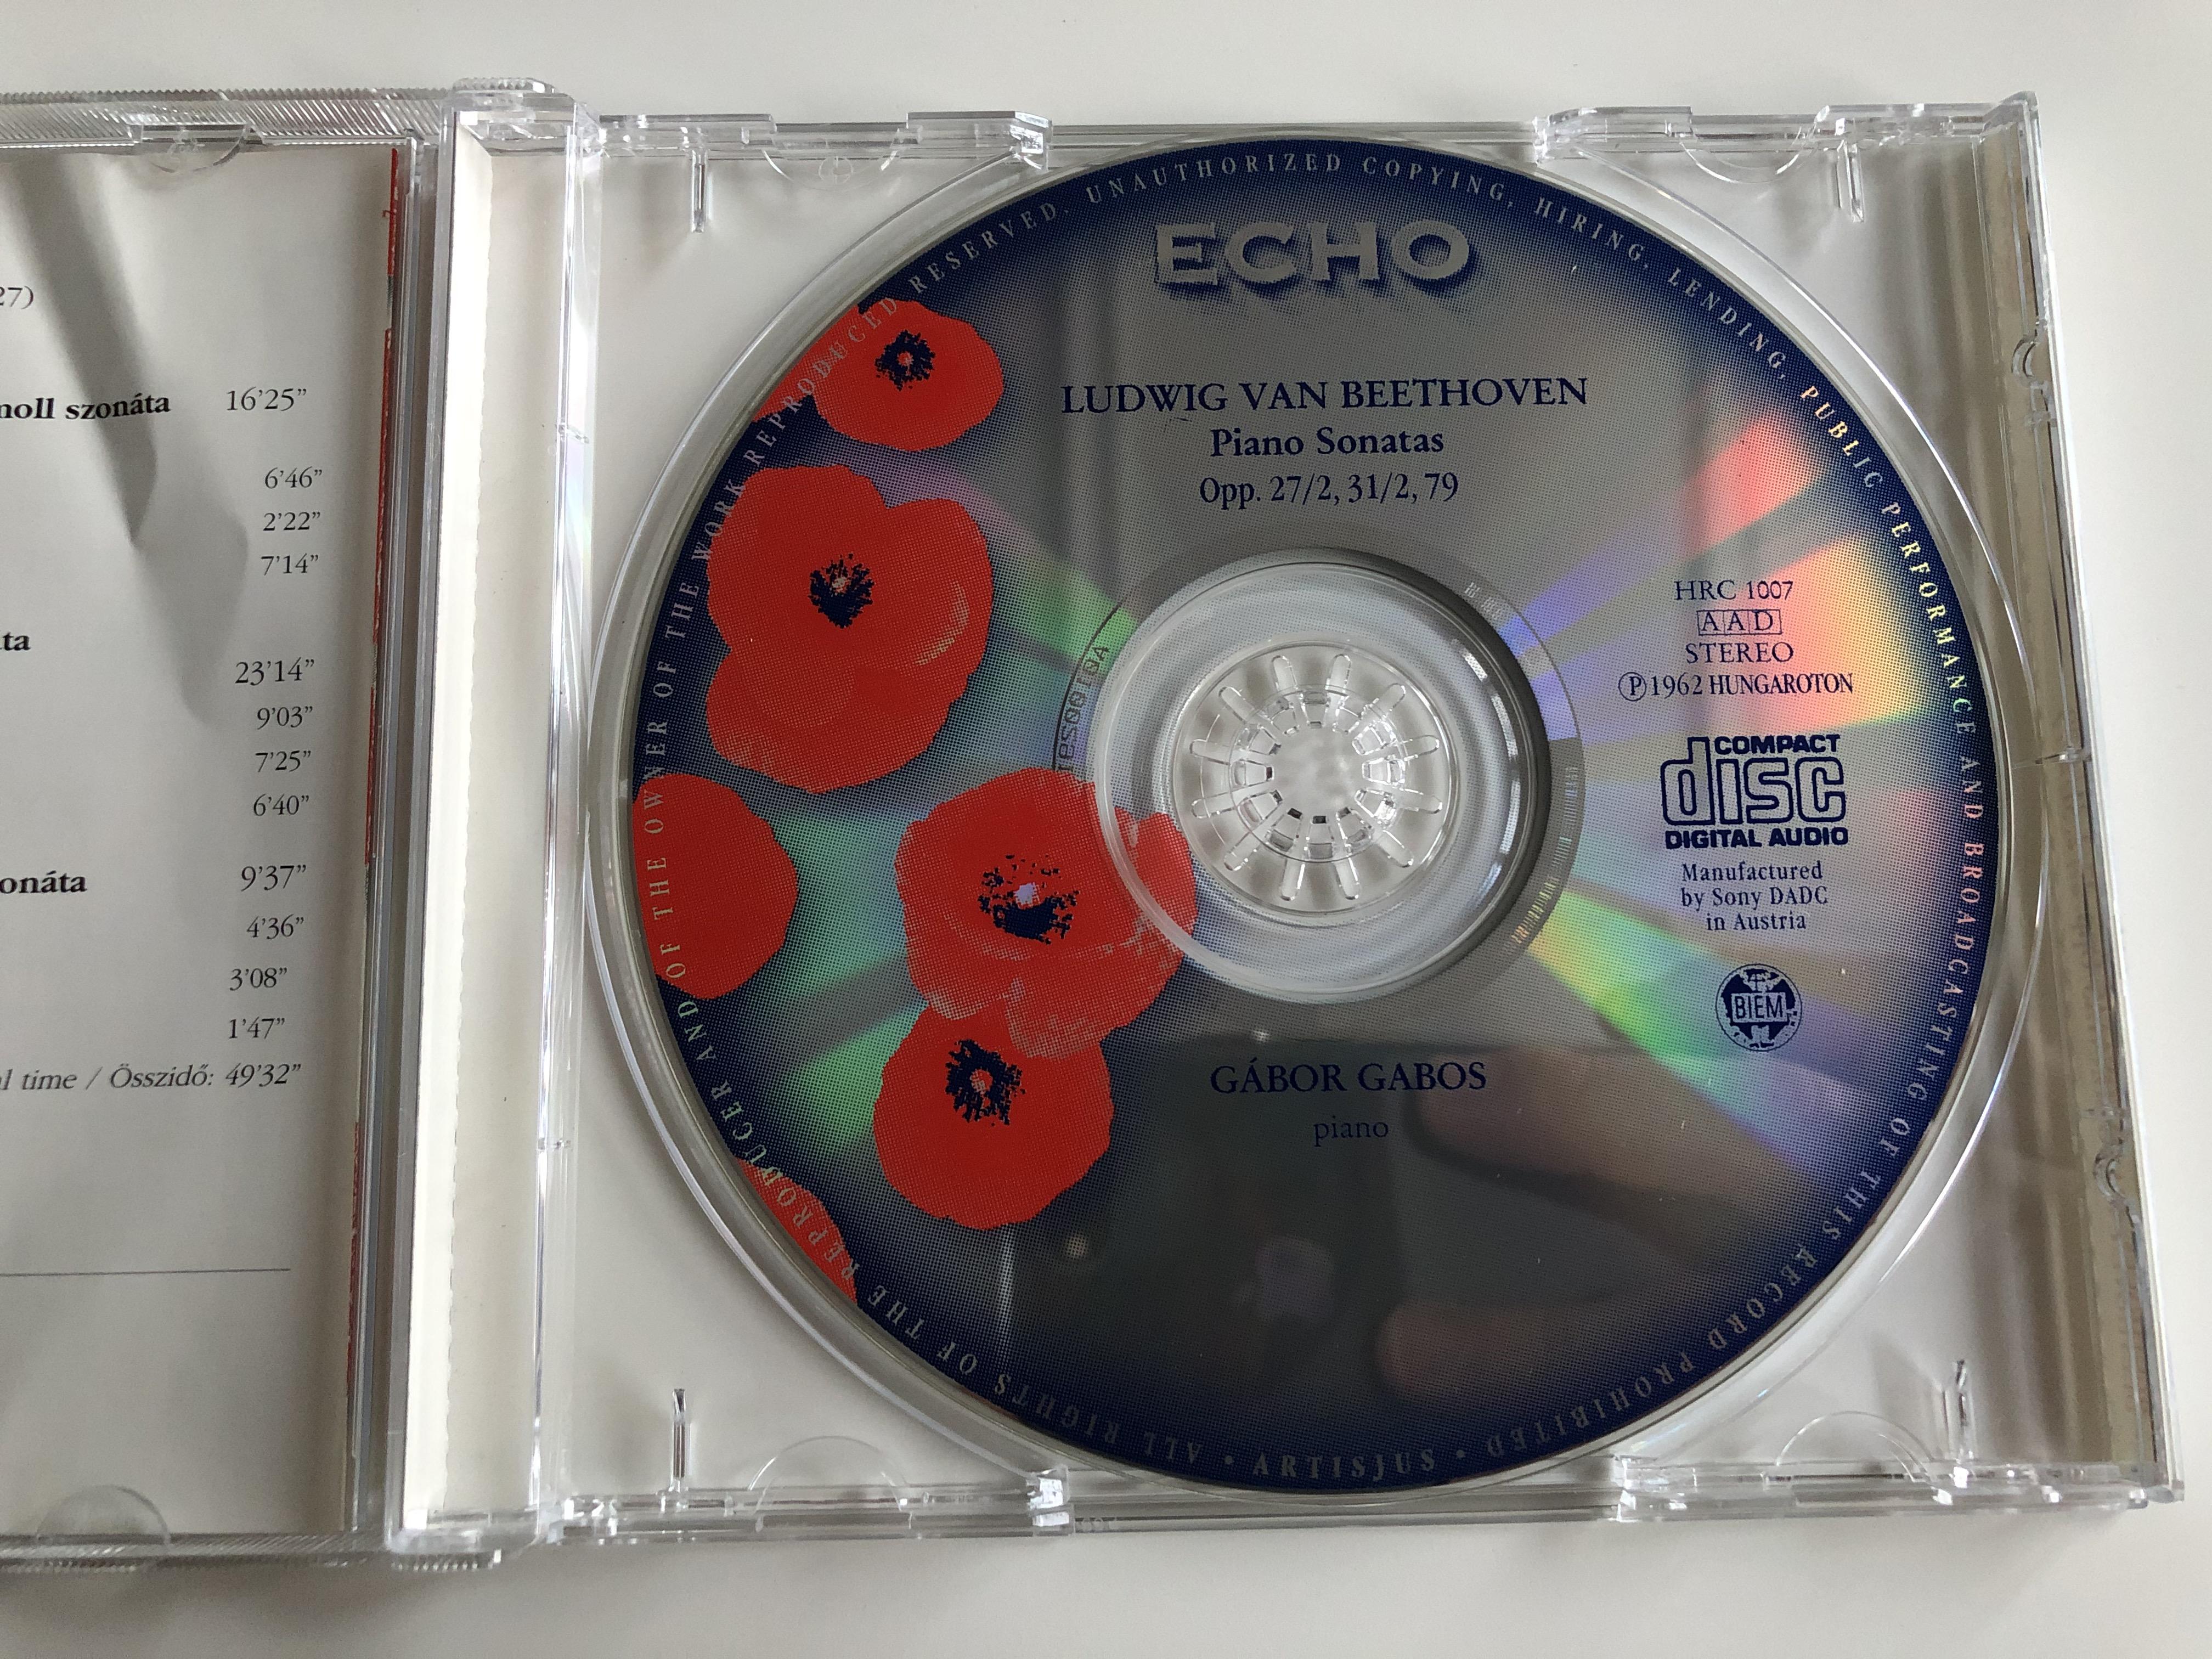 beethoven-piano-sonatas-moonlight-op.-272-tempest-op.-312-g-major-op.79-g-bor-gabos-hungaroton-classic-audio-cd-1962-stereo-hrc-1007-3-.jpg